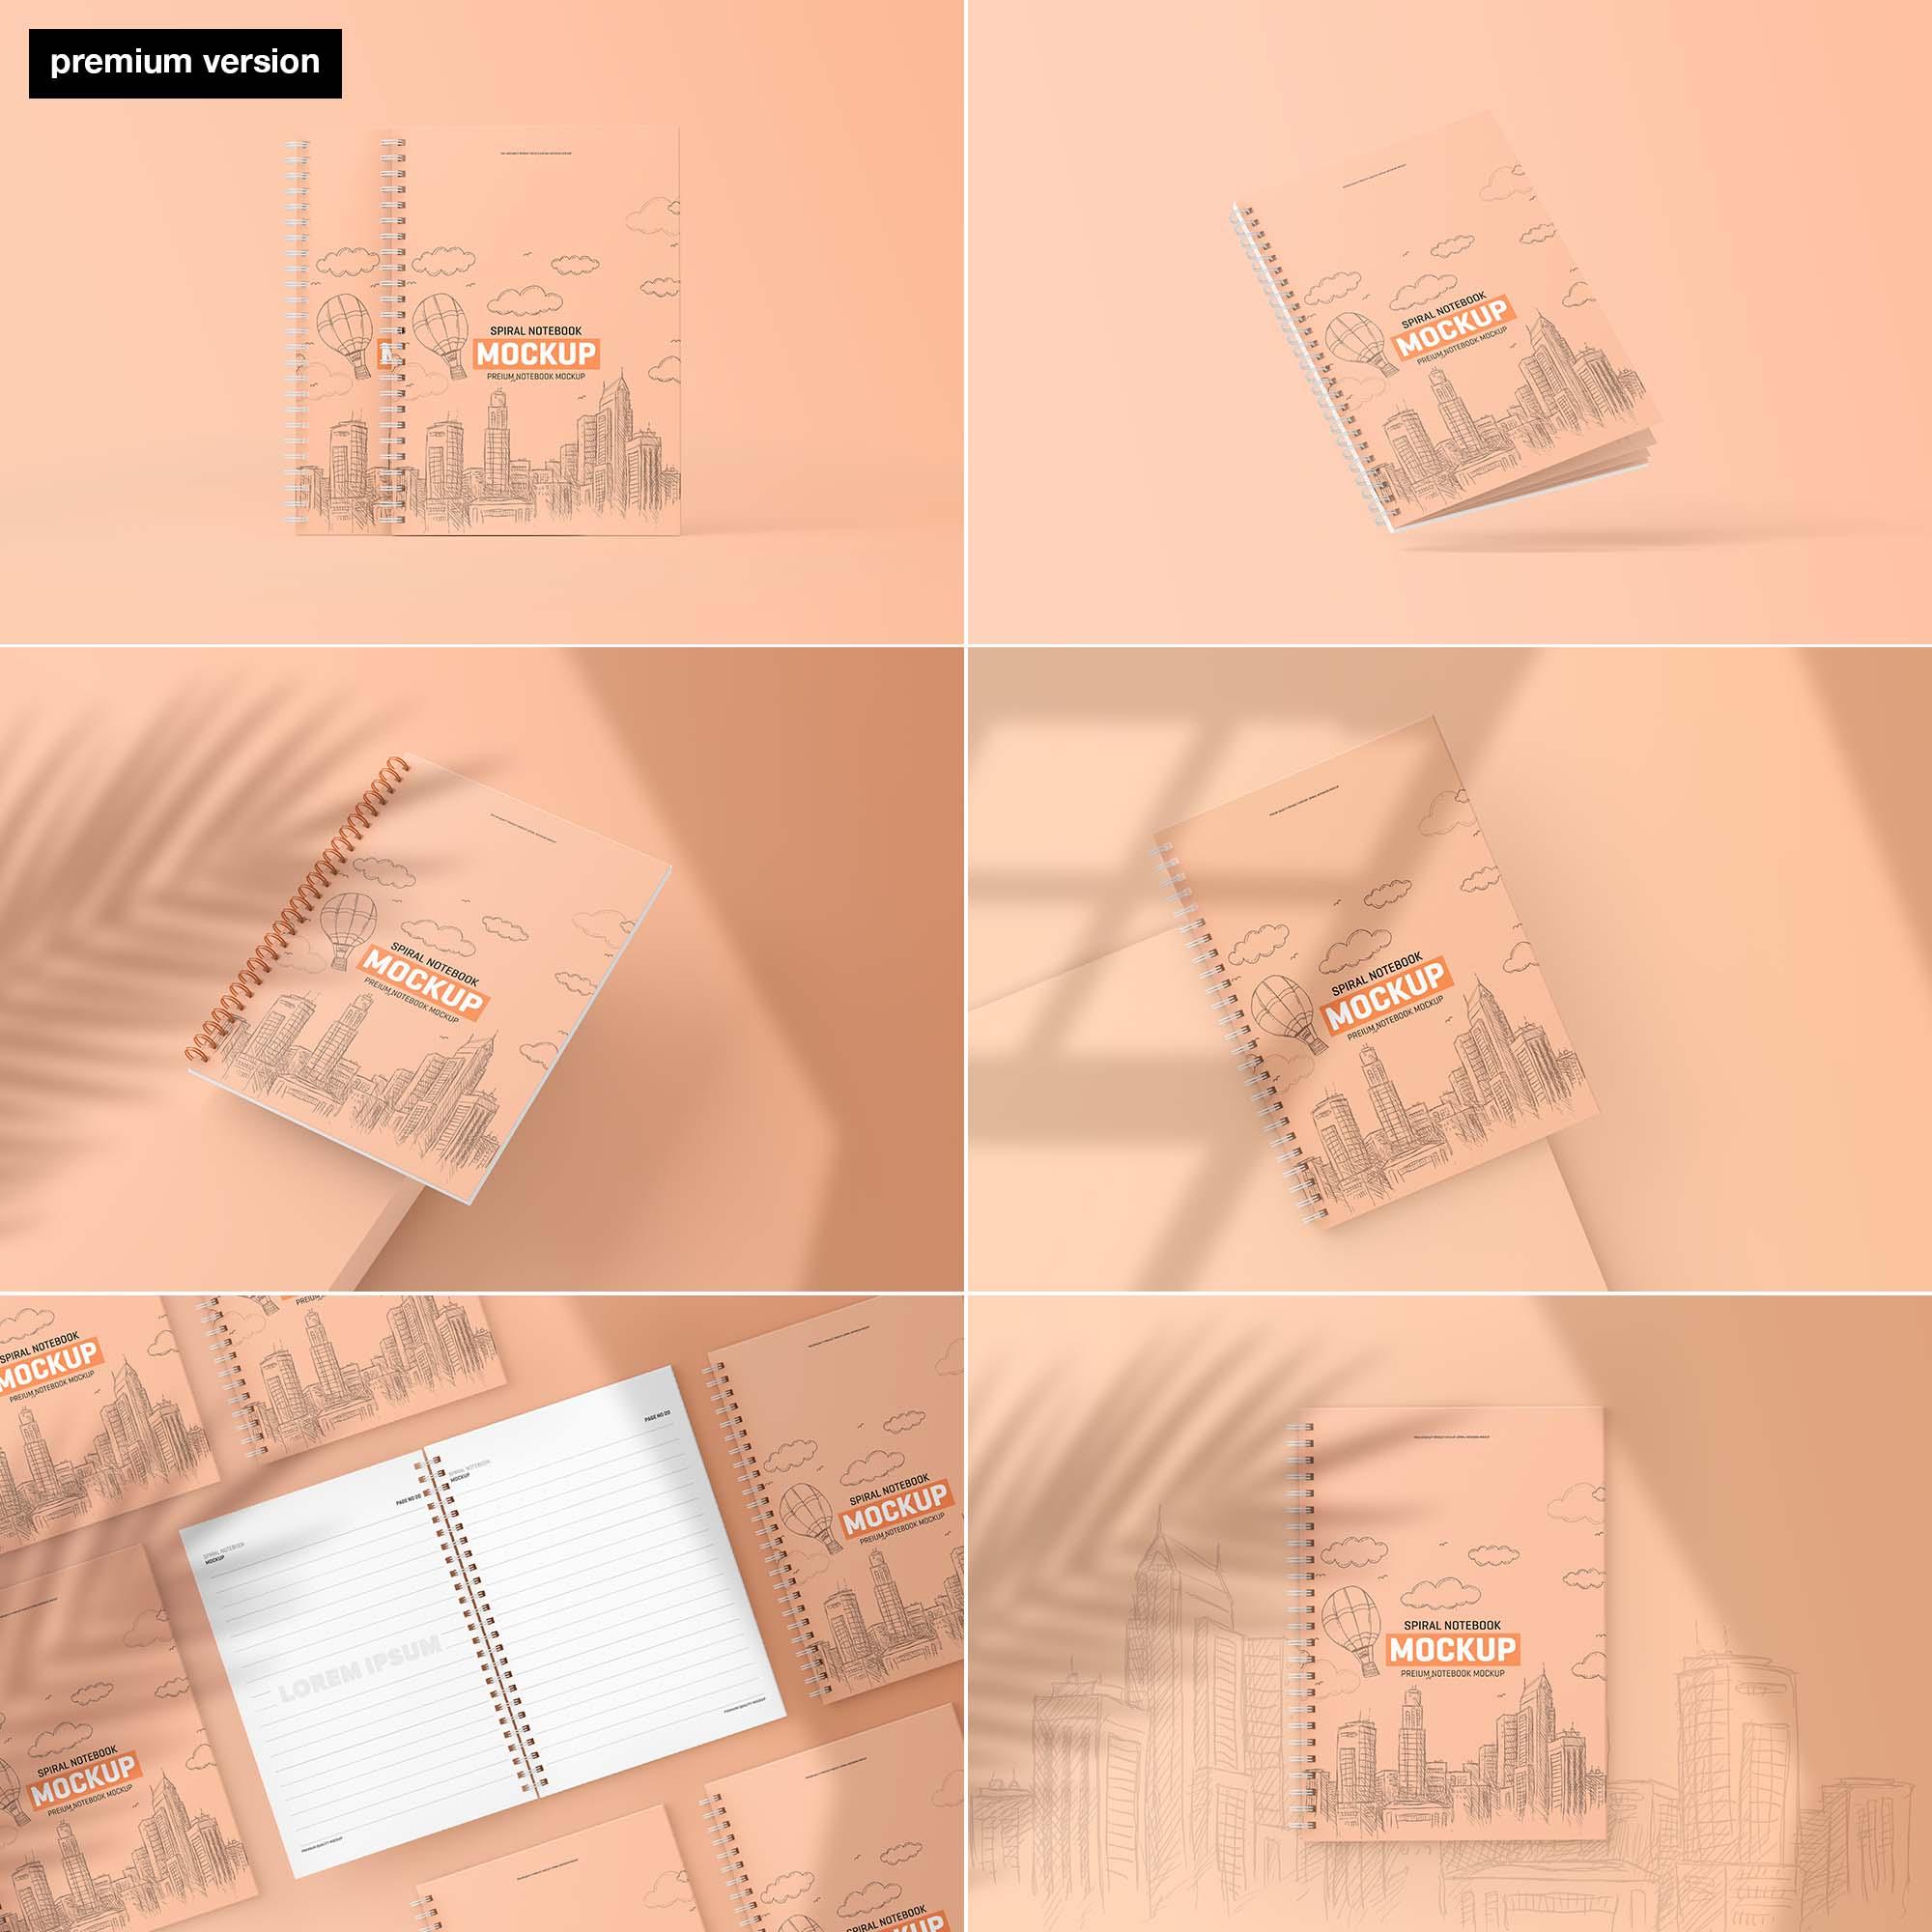 Spiral Notebook Mockup - Premium